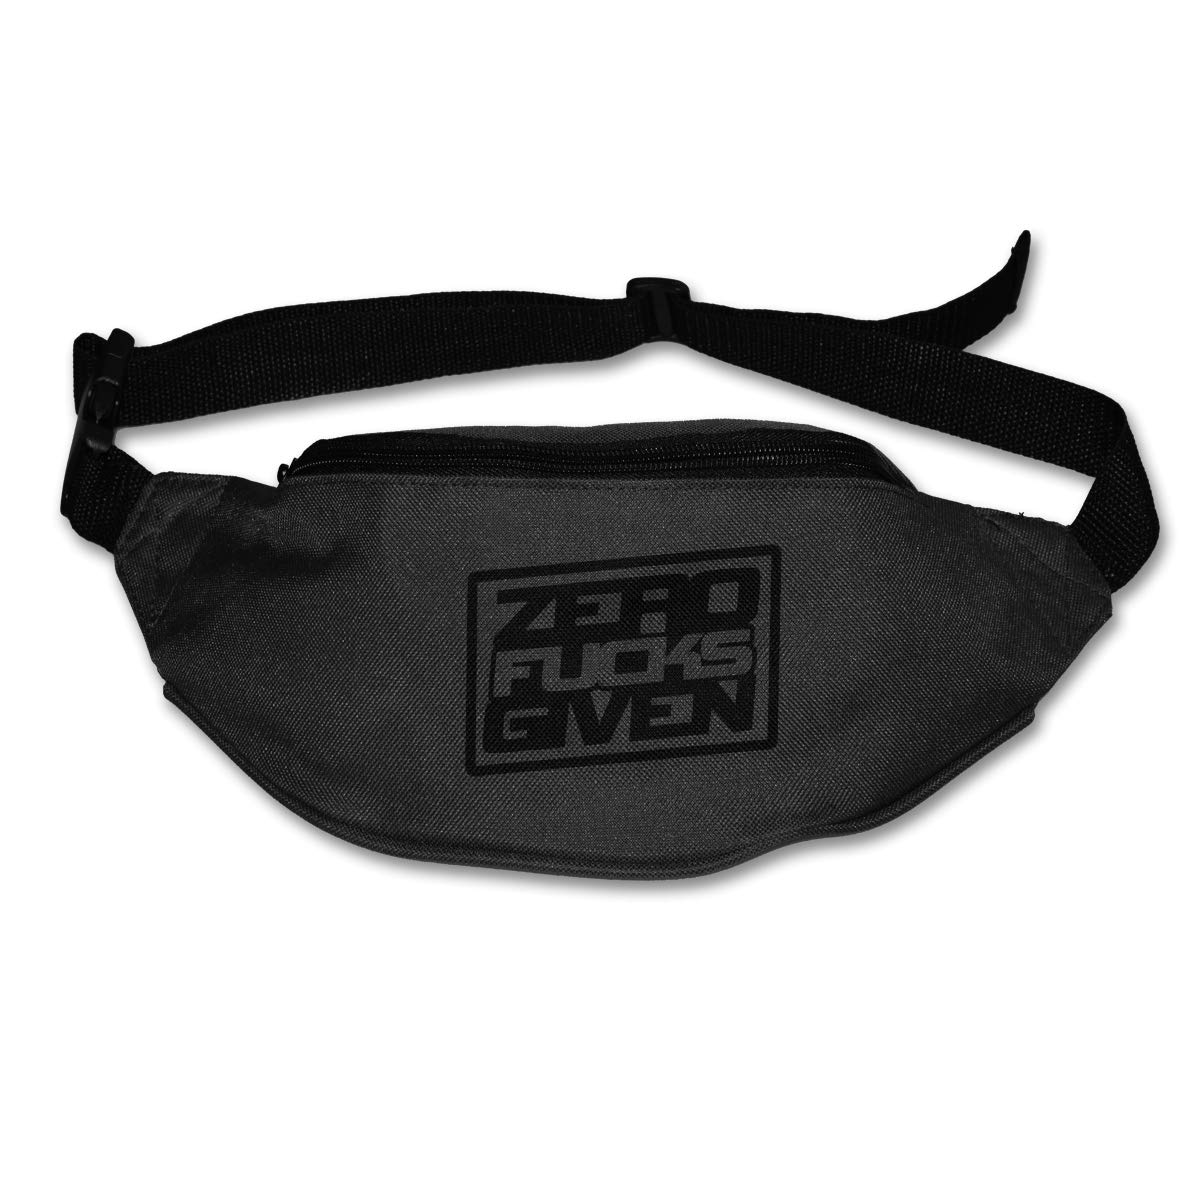 Zero Fucks Given Sport Waist Bag Fanny Pack Adjustable For Run